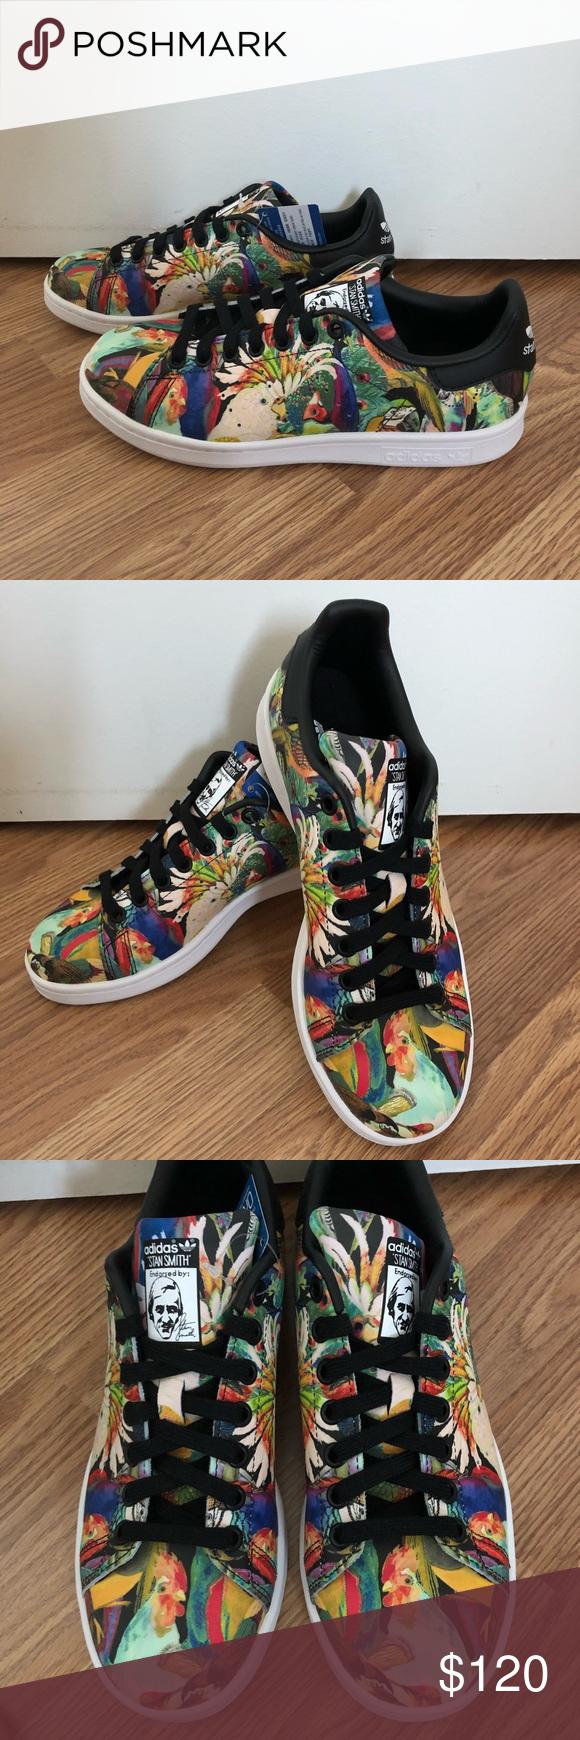 NEW STAN Adidas STAN NEW SMITH Tropical Birds Sneakers NWT My Posh Picks 436470